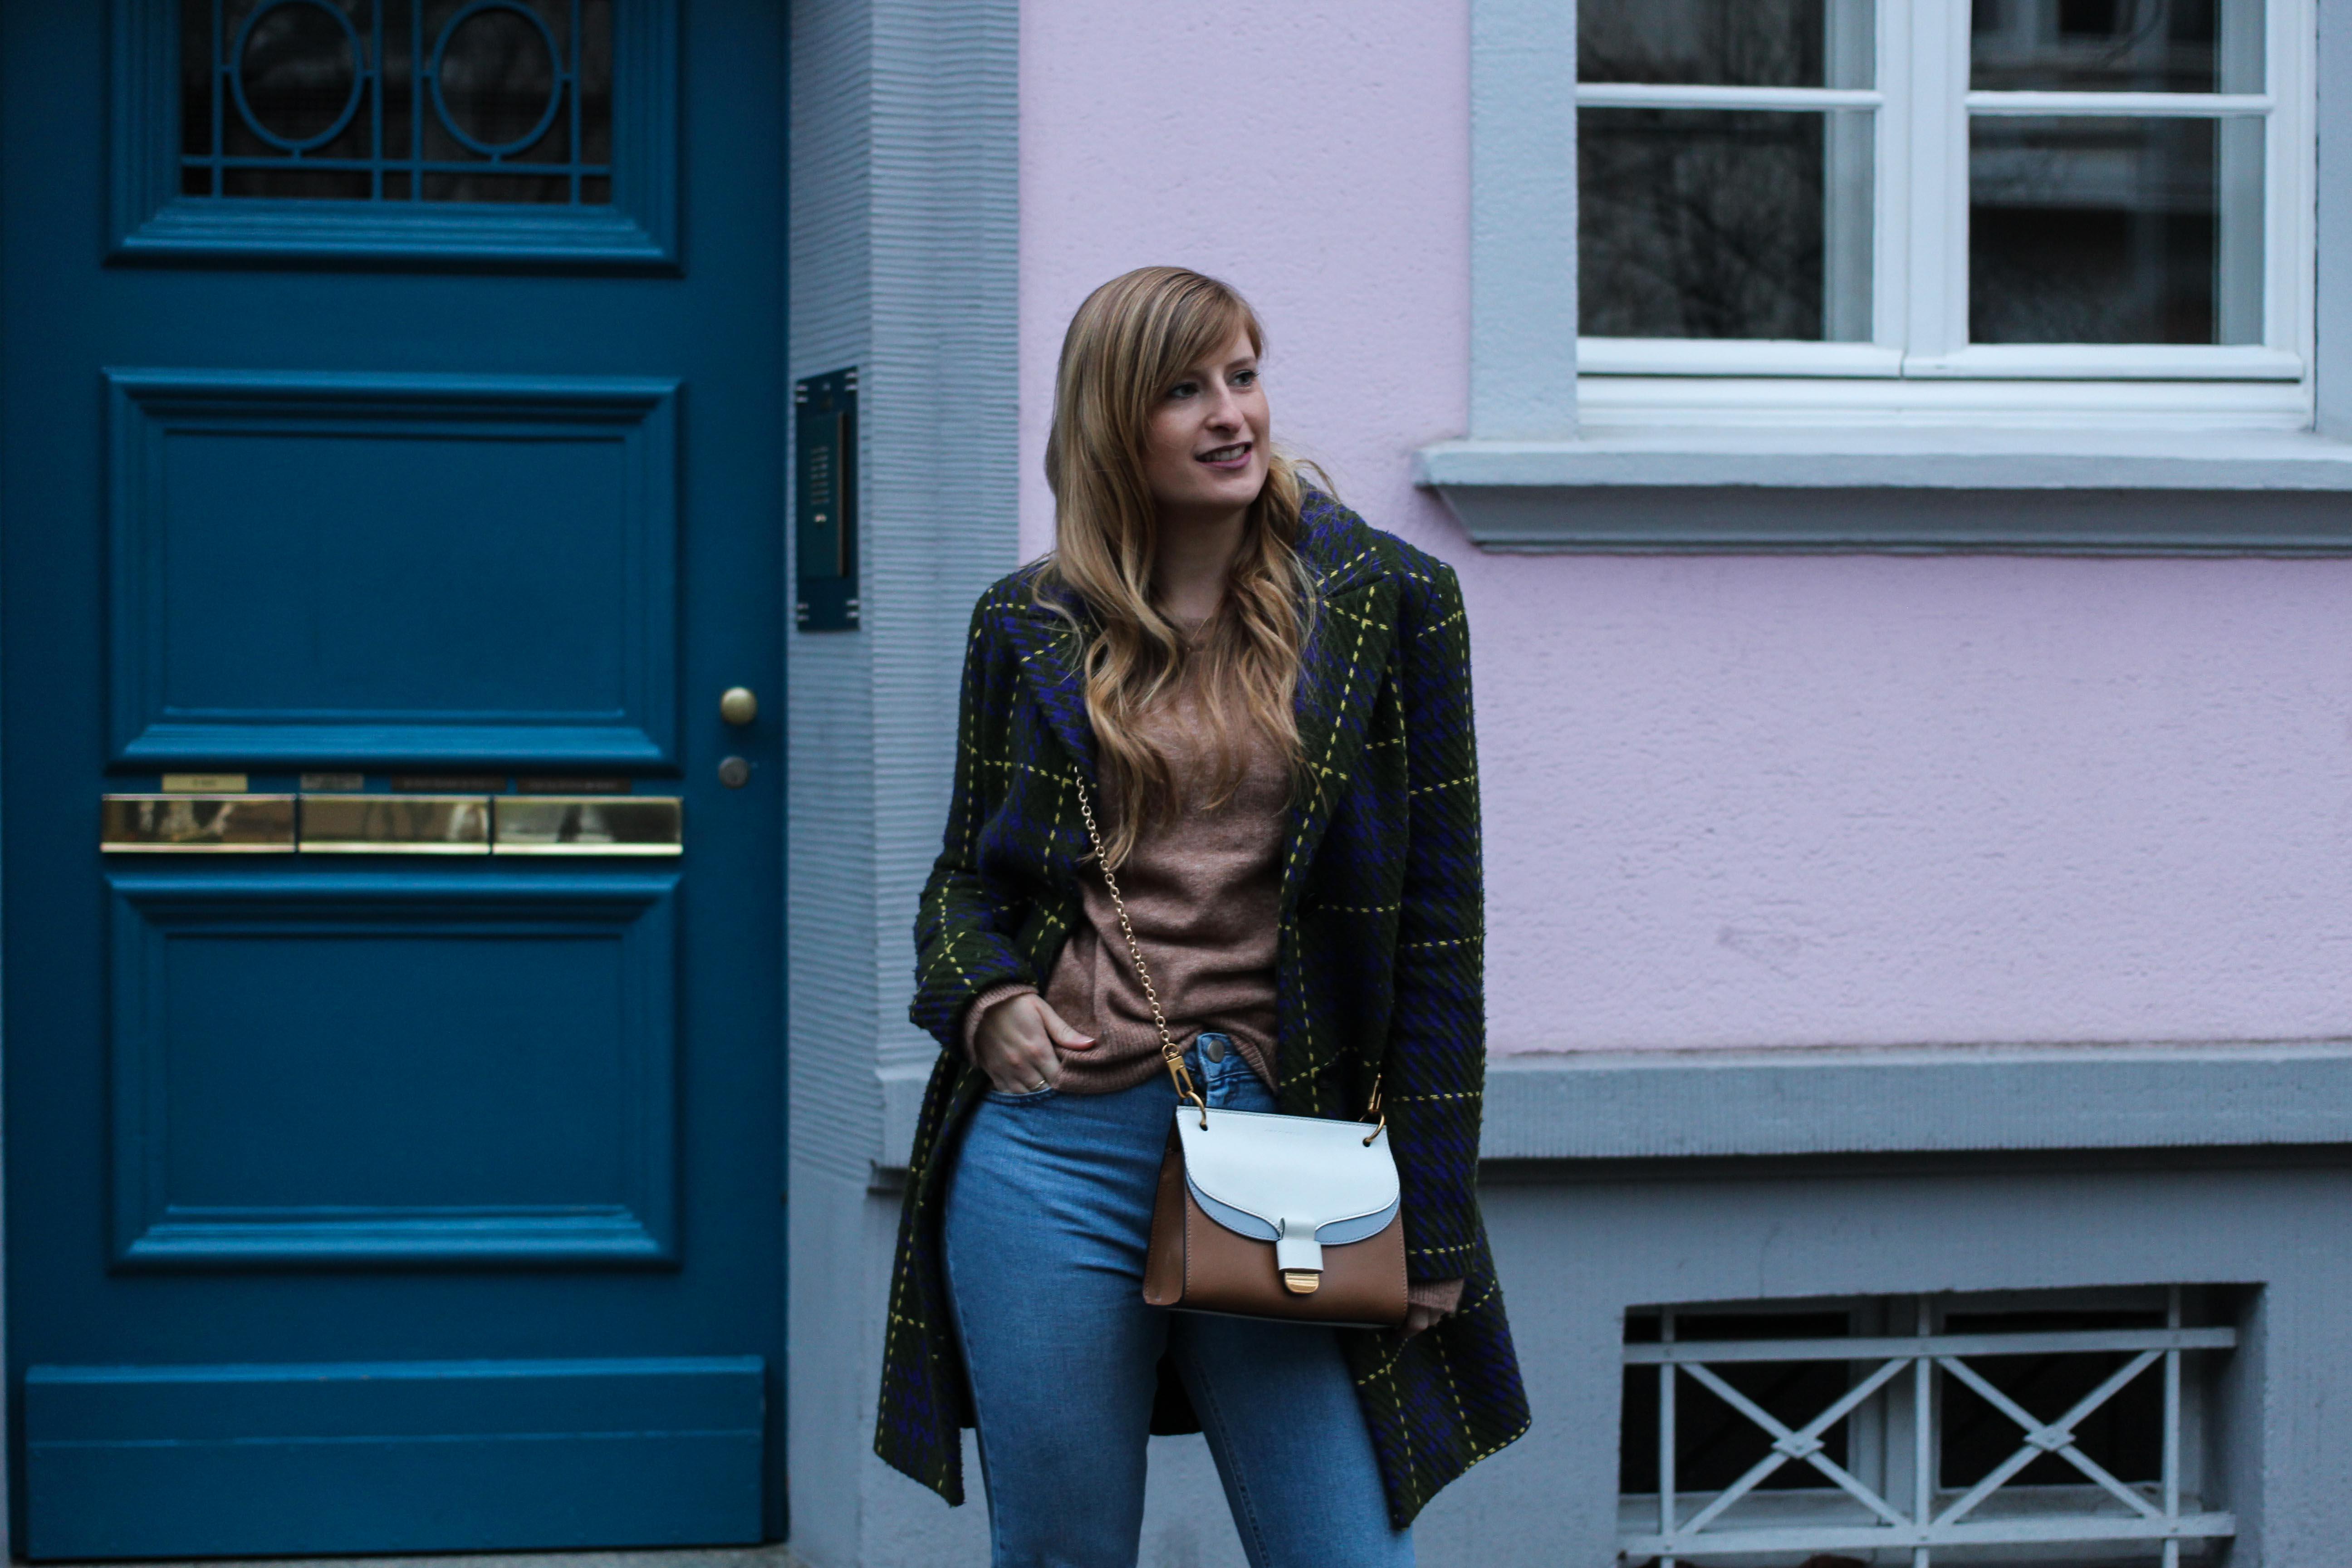 Herbst Must-Have 2019 Karomantel. Herbstmode Herbsttrend Mantel karriert Modeblog Outfit Herbst Fashion Blog Bonn 4